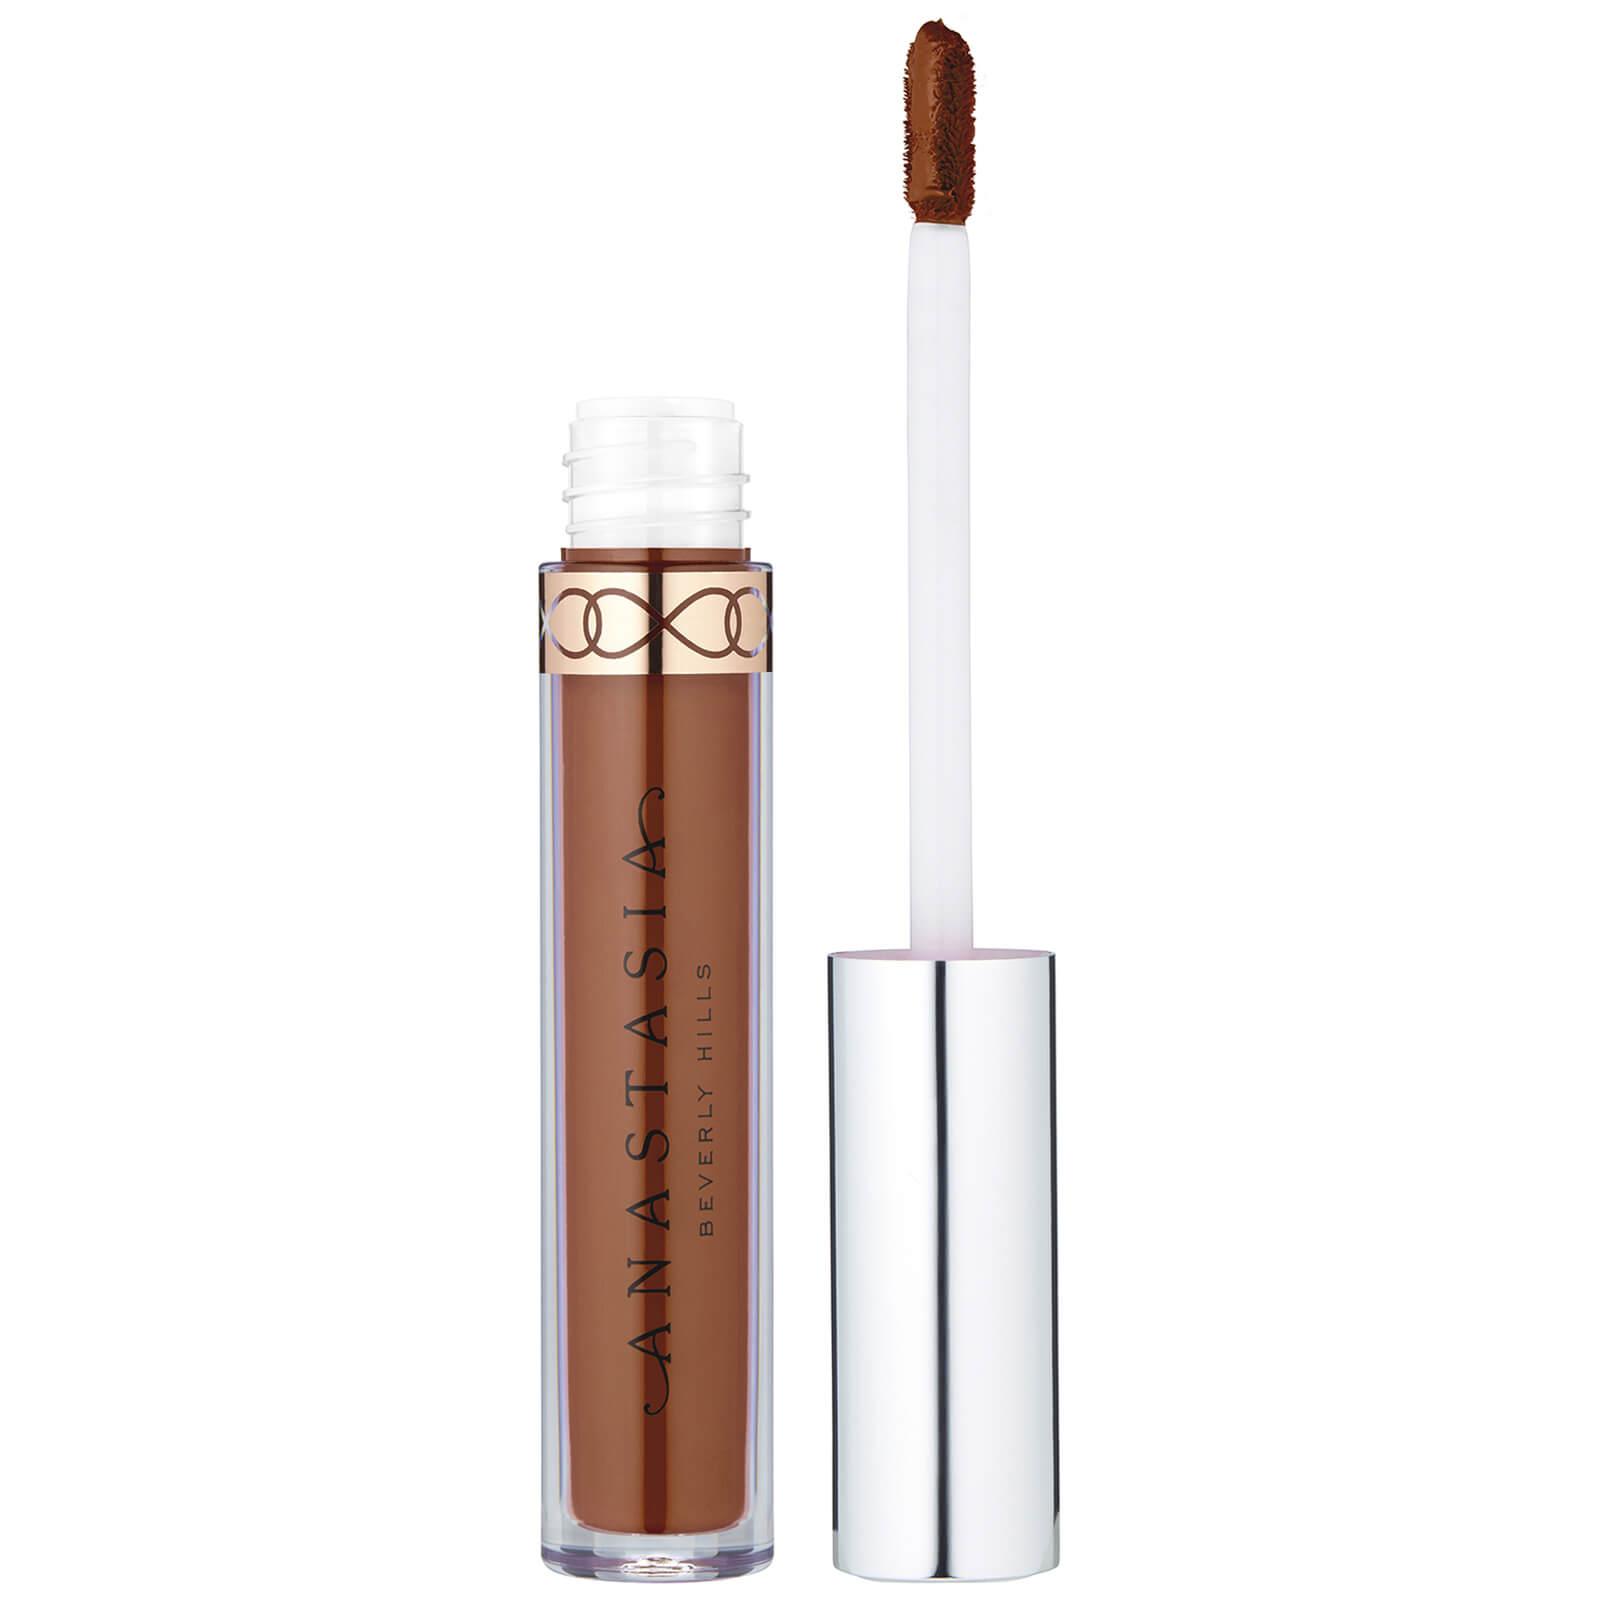 Anastasia Beverly Hills Liquid Lipstick 3.2g (Various Shades) - Ashton